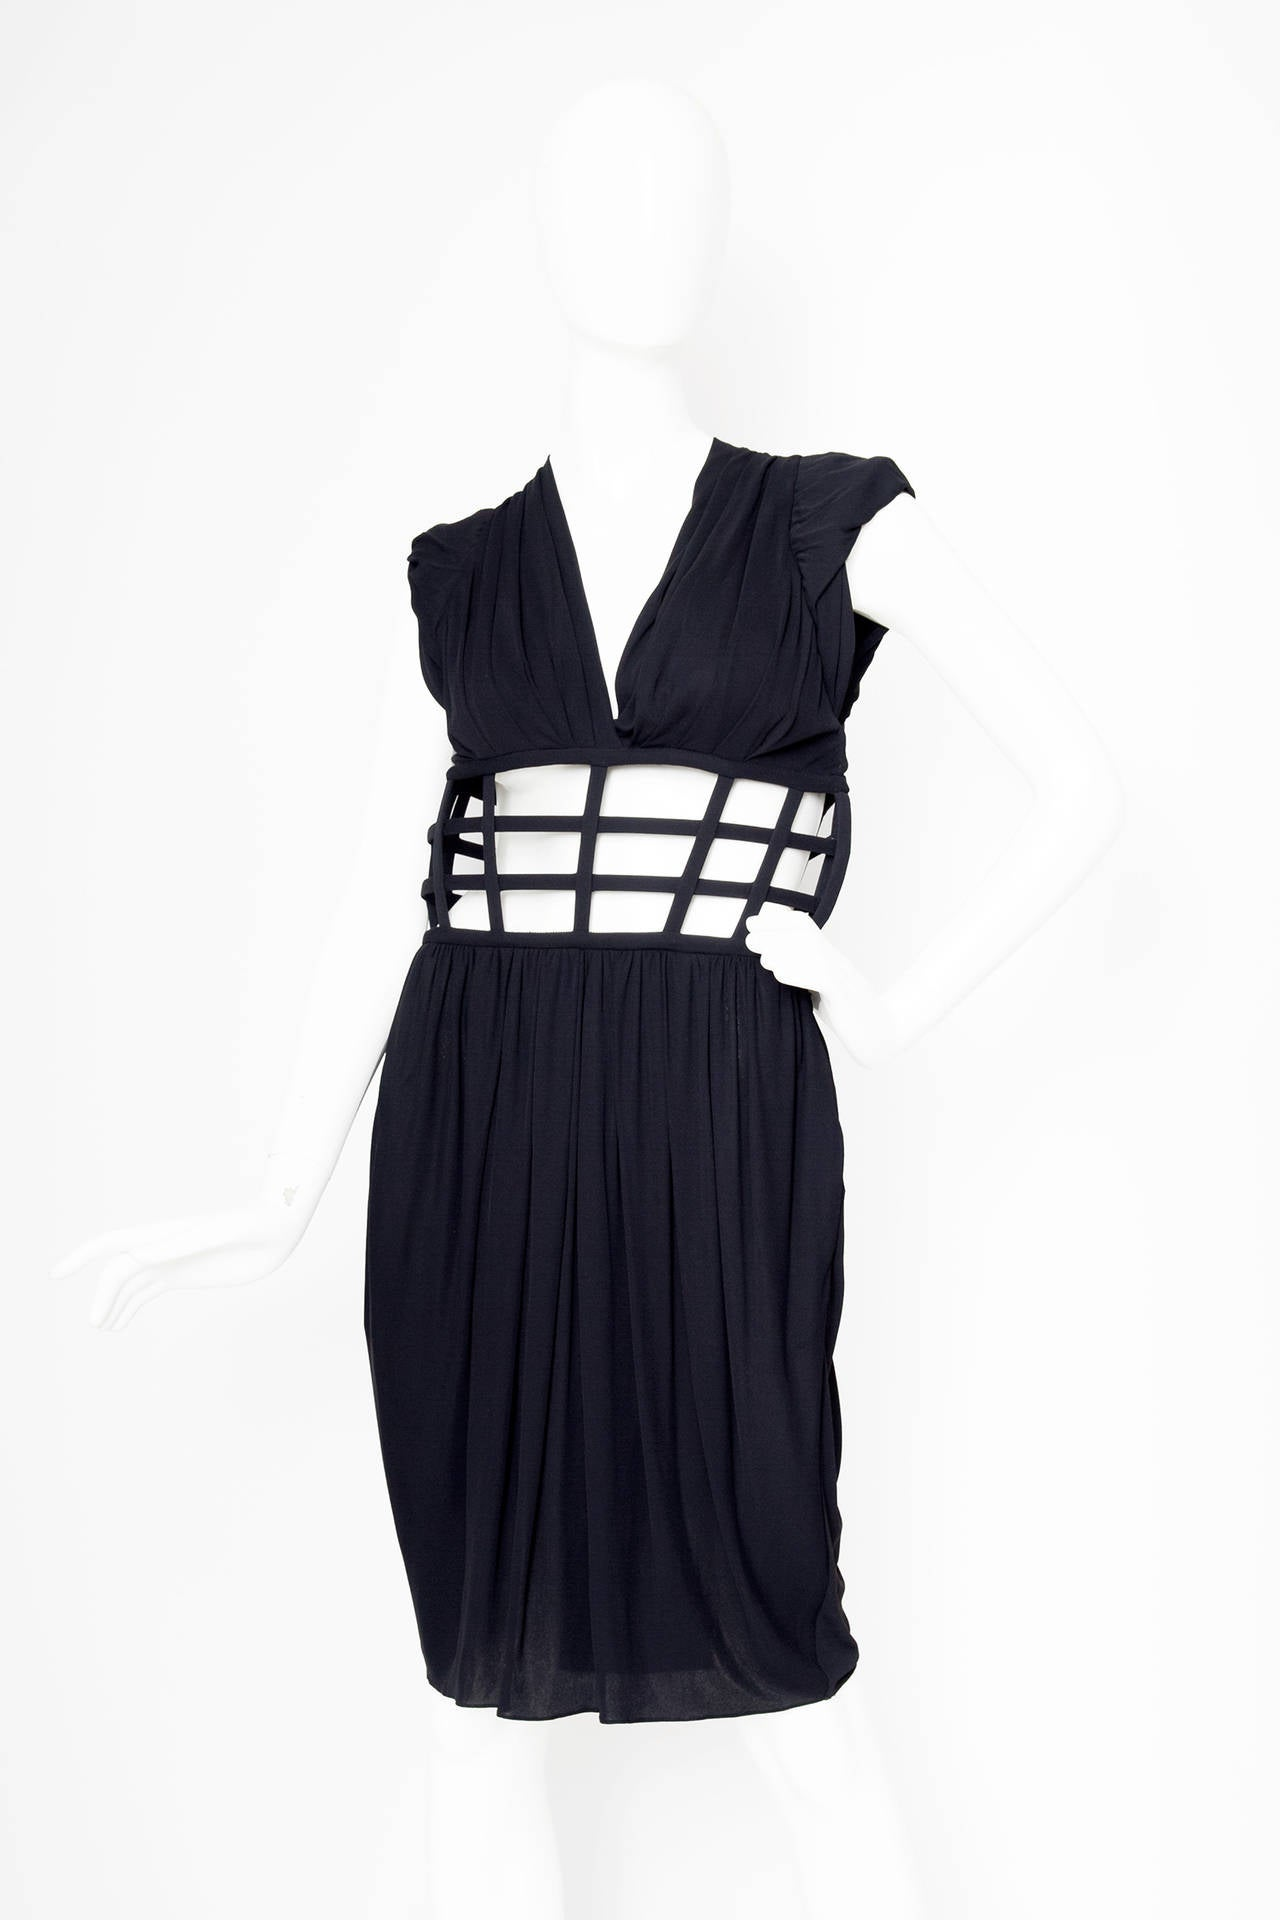 1990s Jean Paul Gaultier Black Corset Dress 2